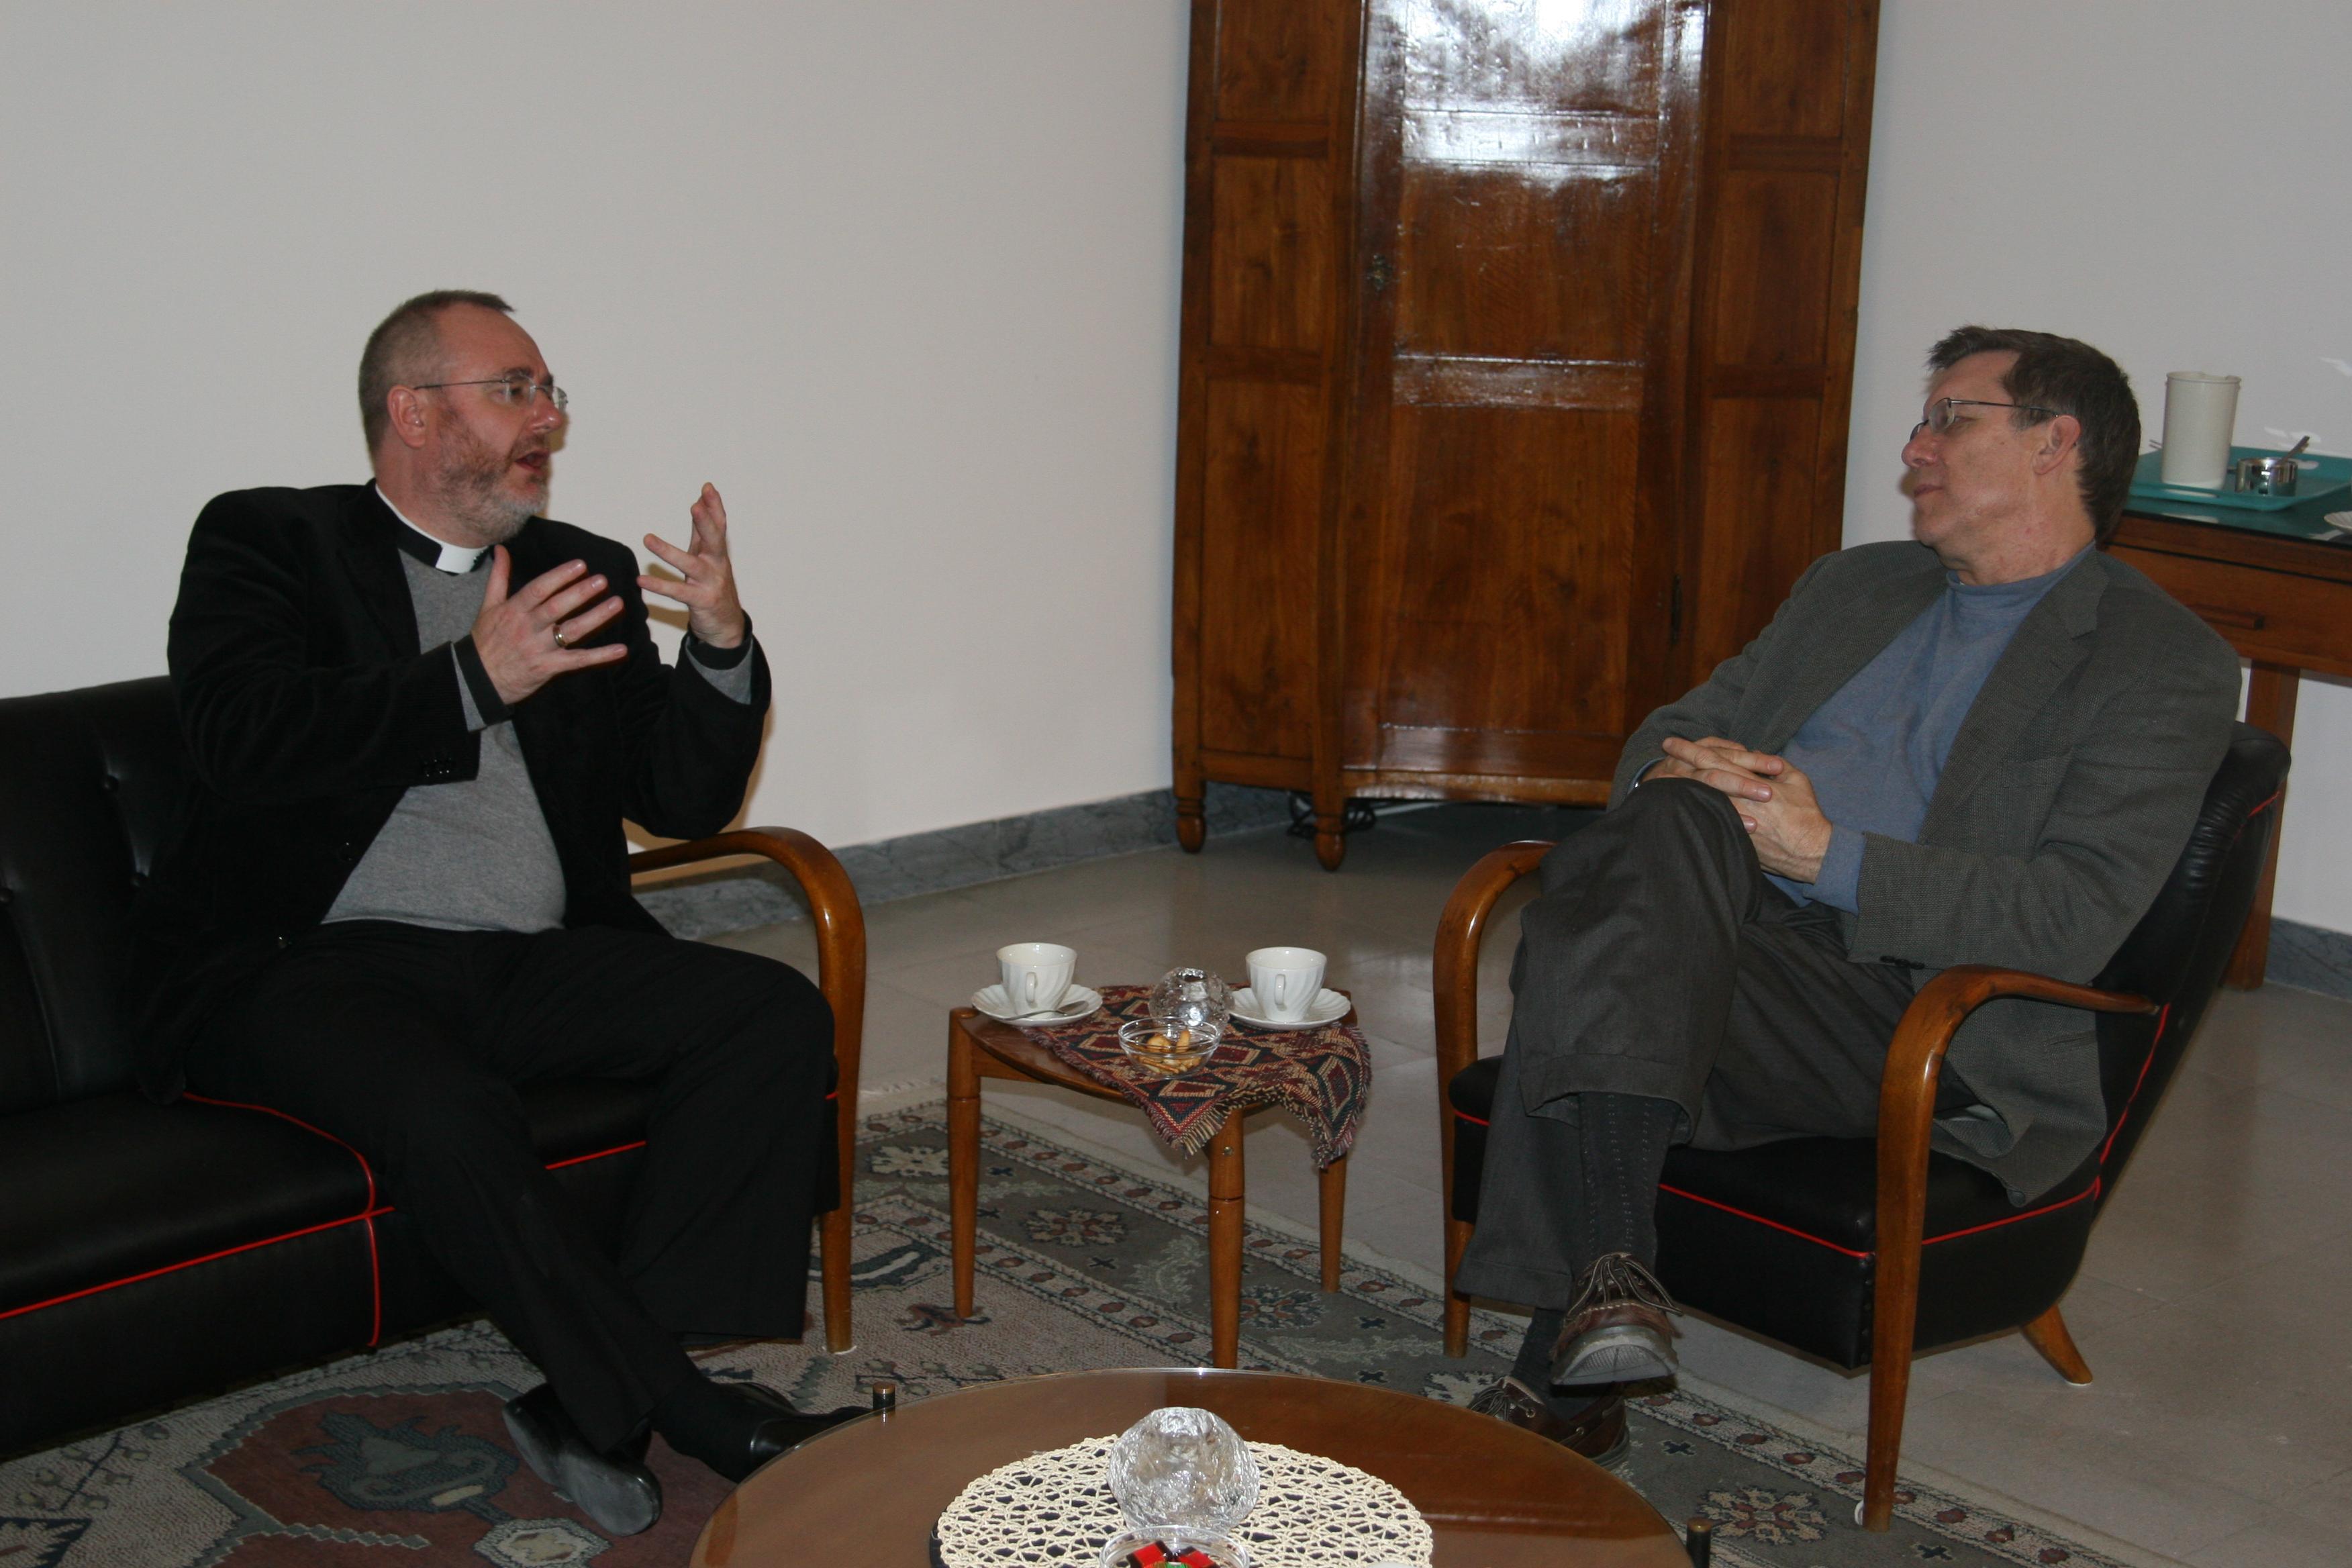 Bordman and Gaillardetz